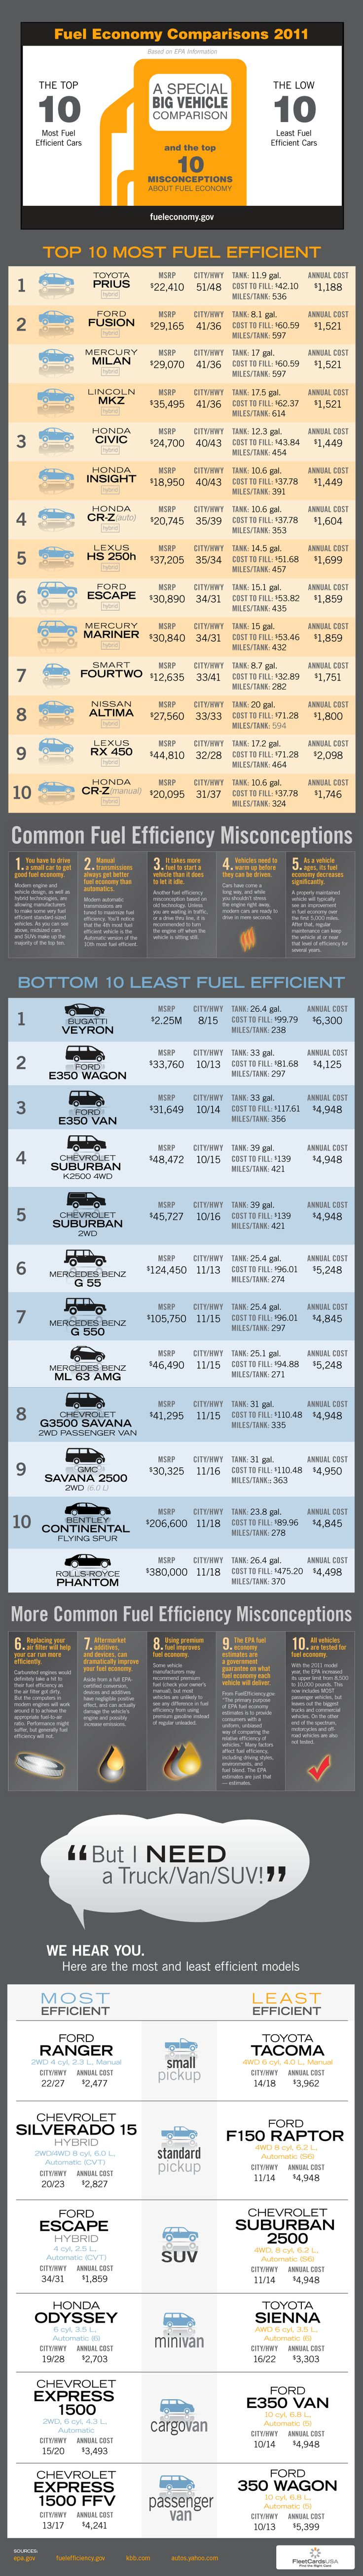 Fuel Economy Comparisons 2011 FleetCards USA